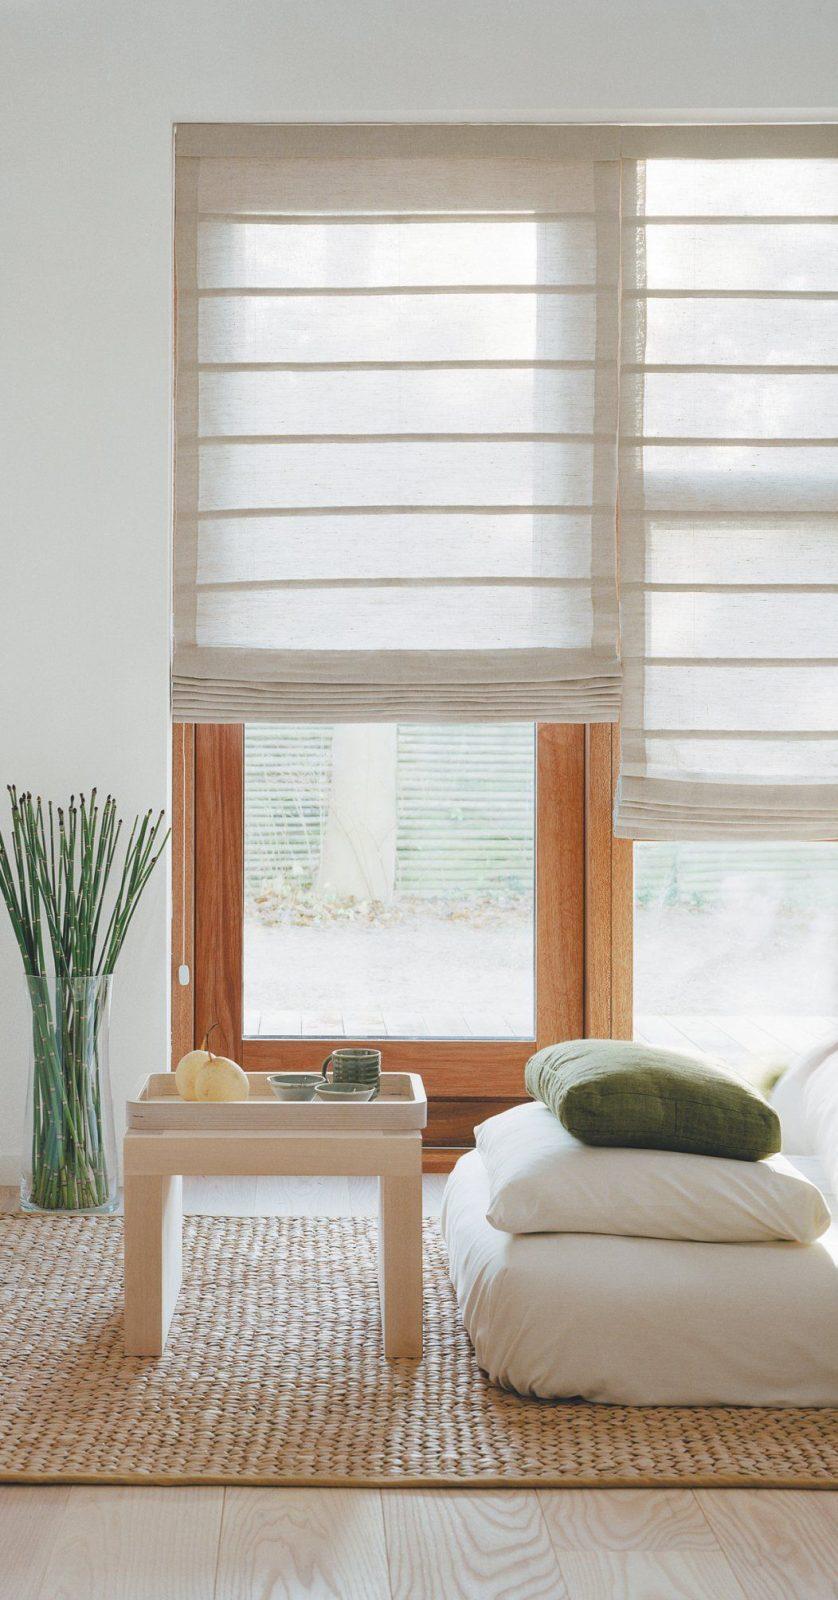 rollo am befestigen trendy hausdesign exquisit schalusie ikea fantastisch jalousien ohne bohren. Black Bedroom Furniture Sets. Home Design Ideas